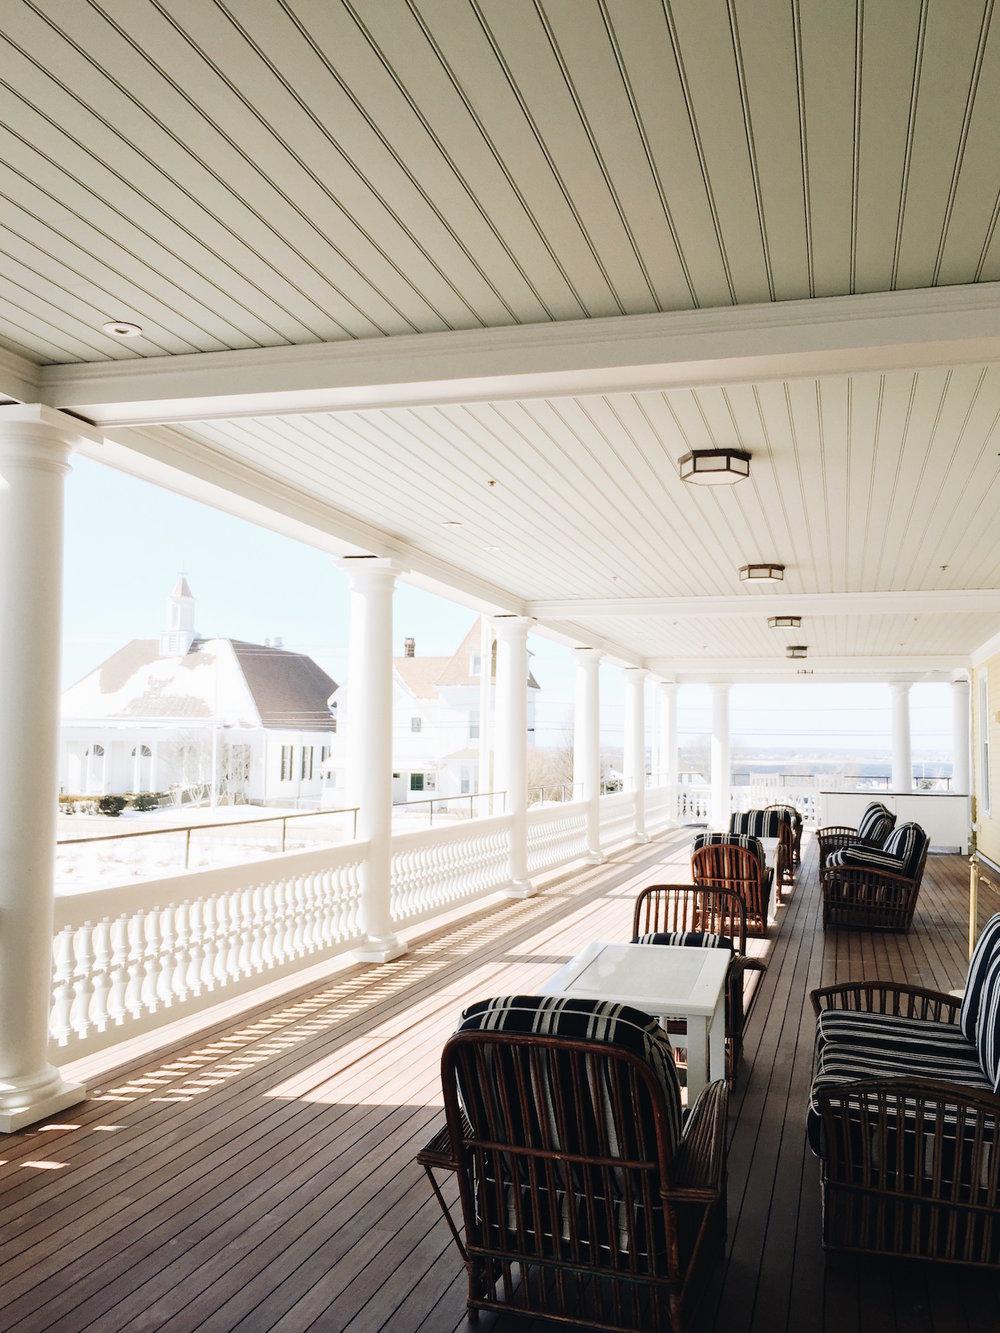 s-space-veranda.JPG